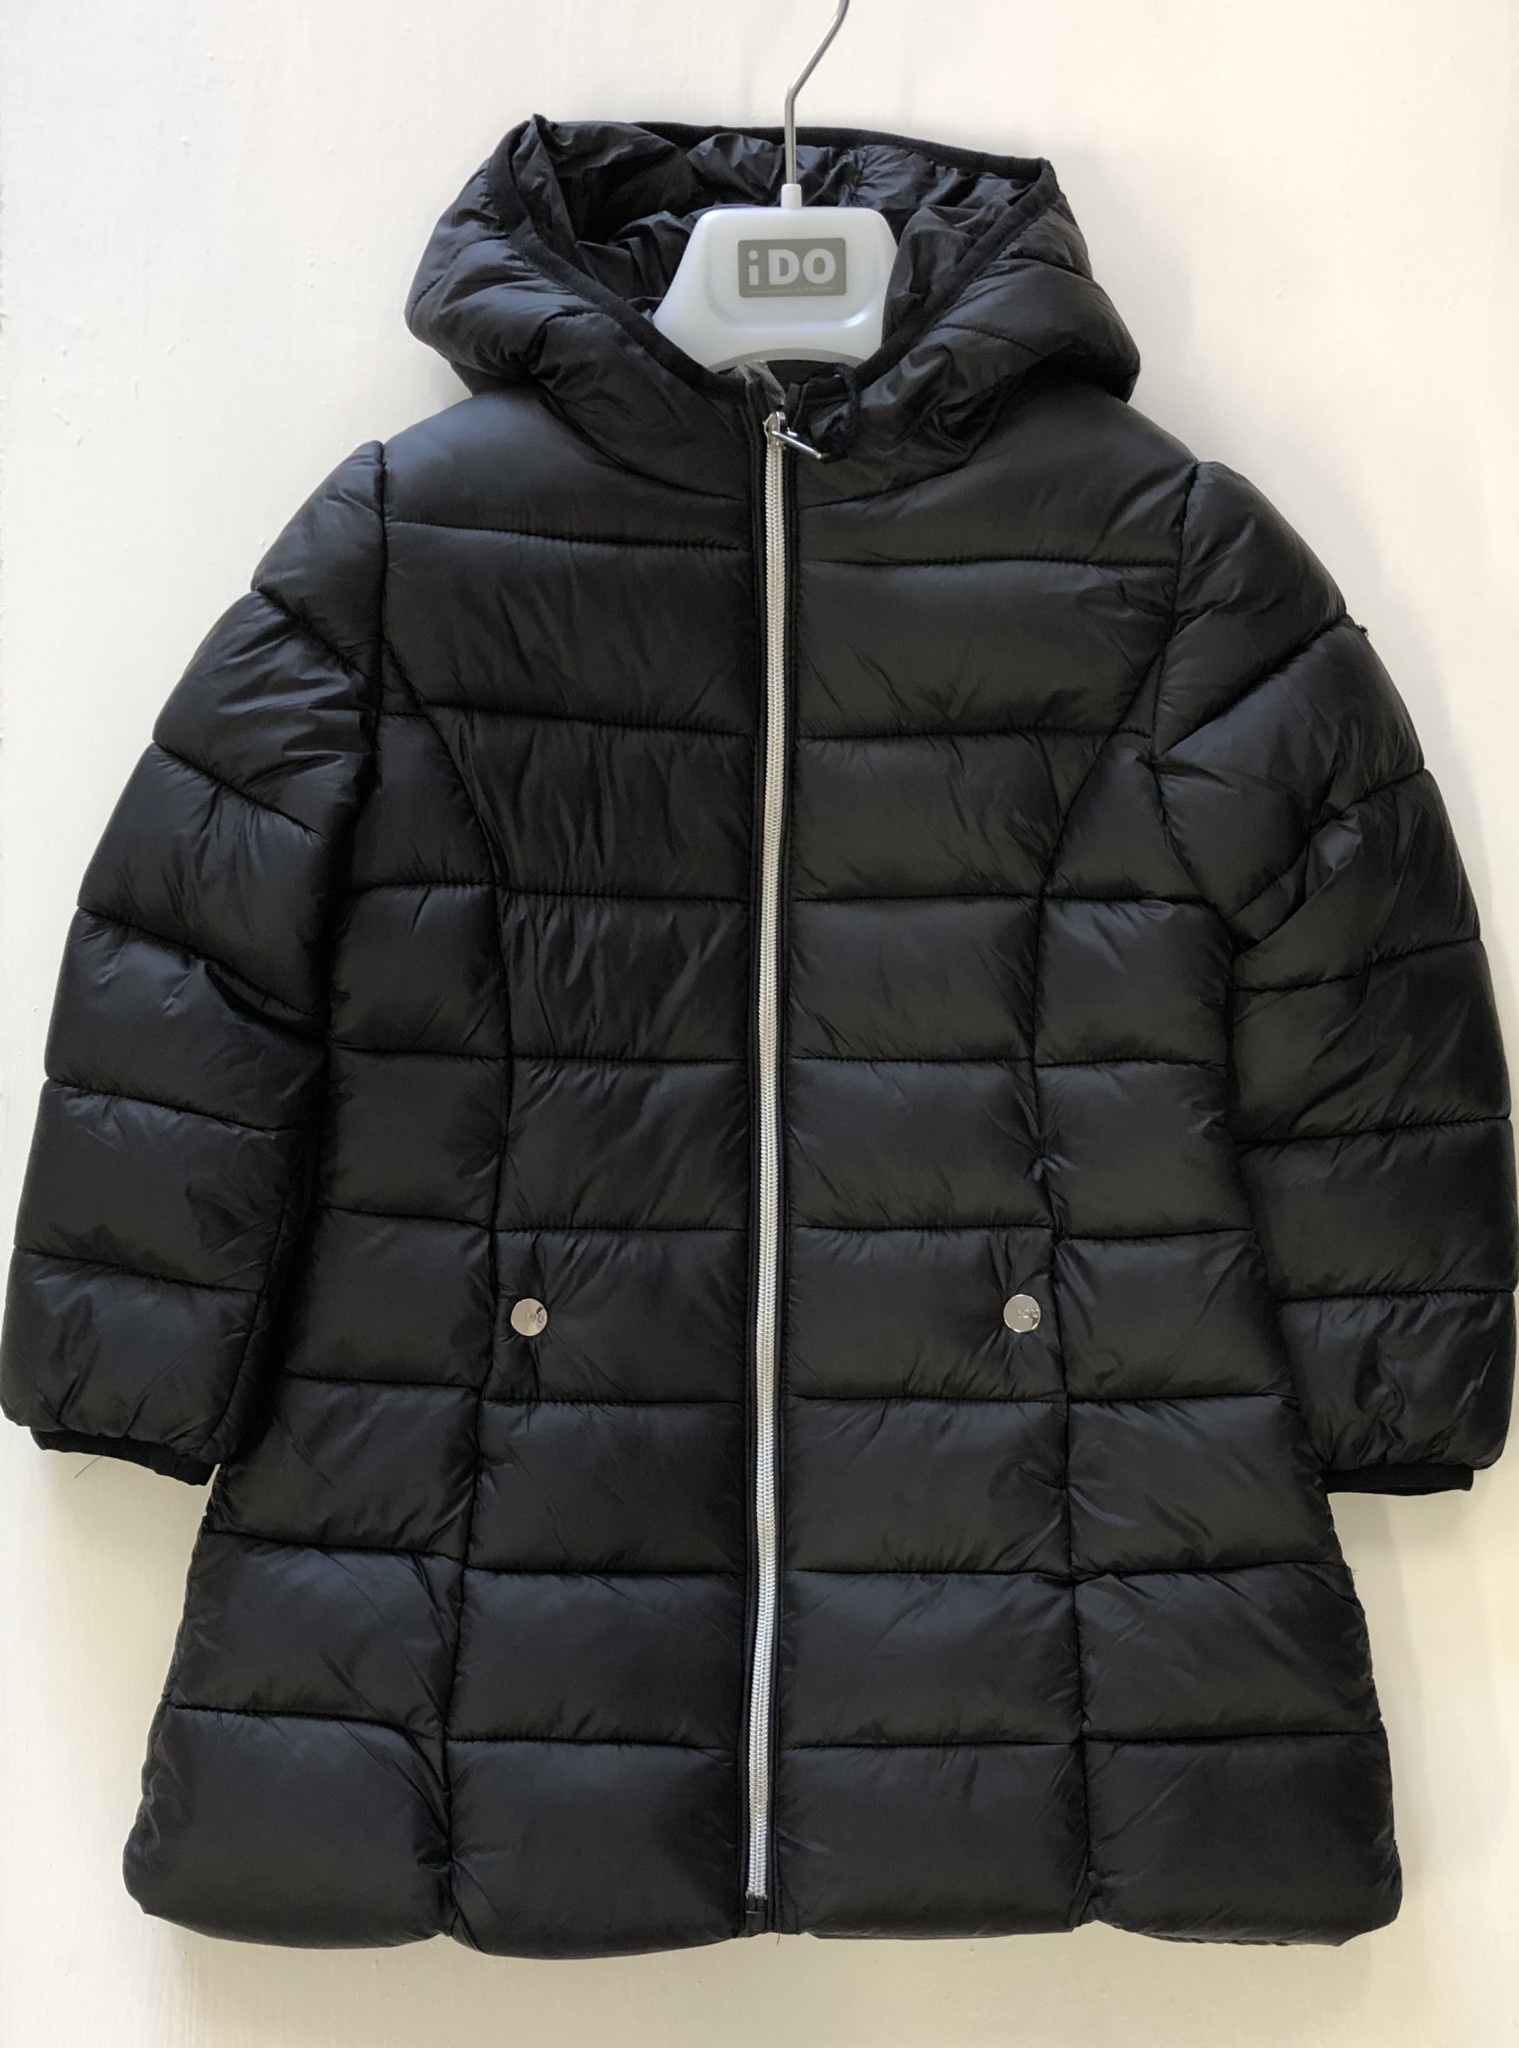 Ido IDo K693 Black Thermal Padded Jacket